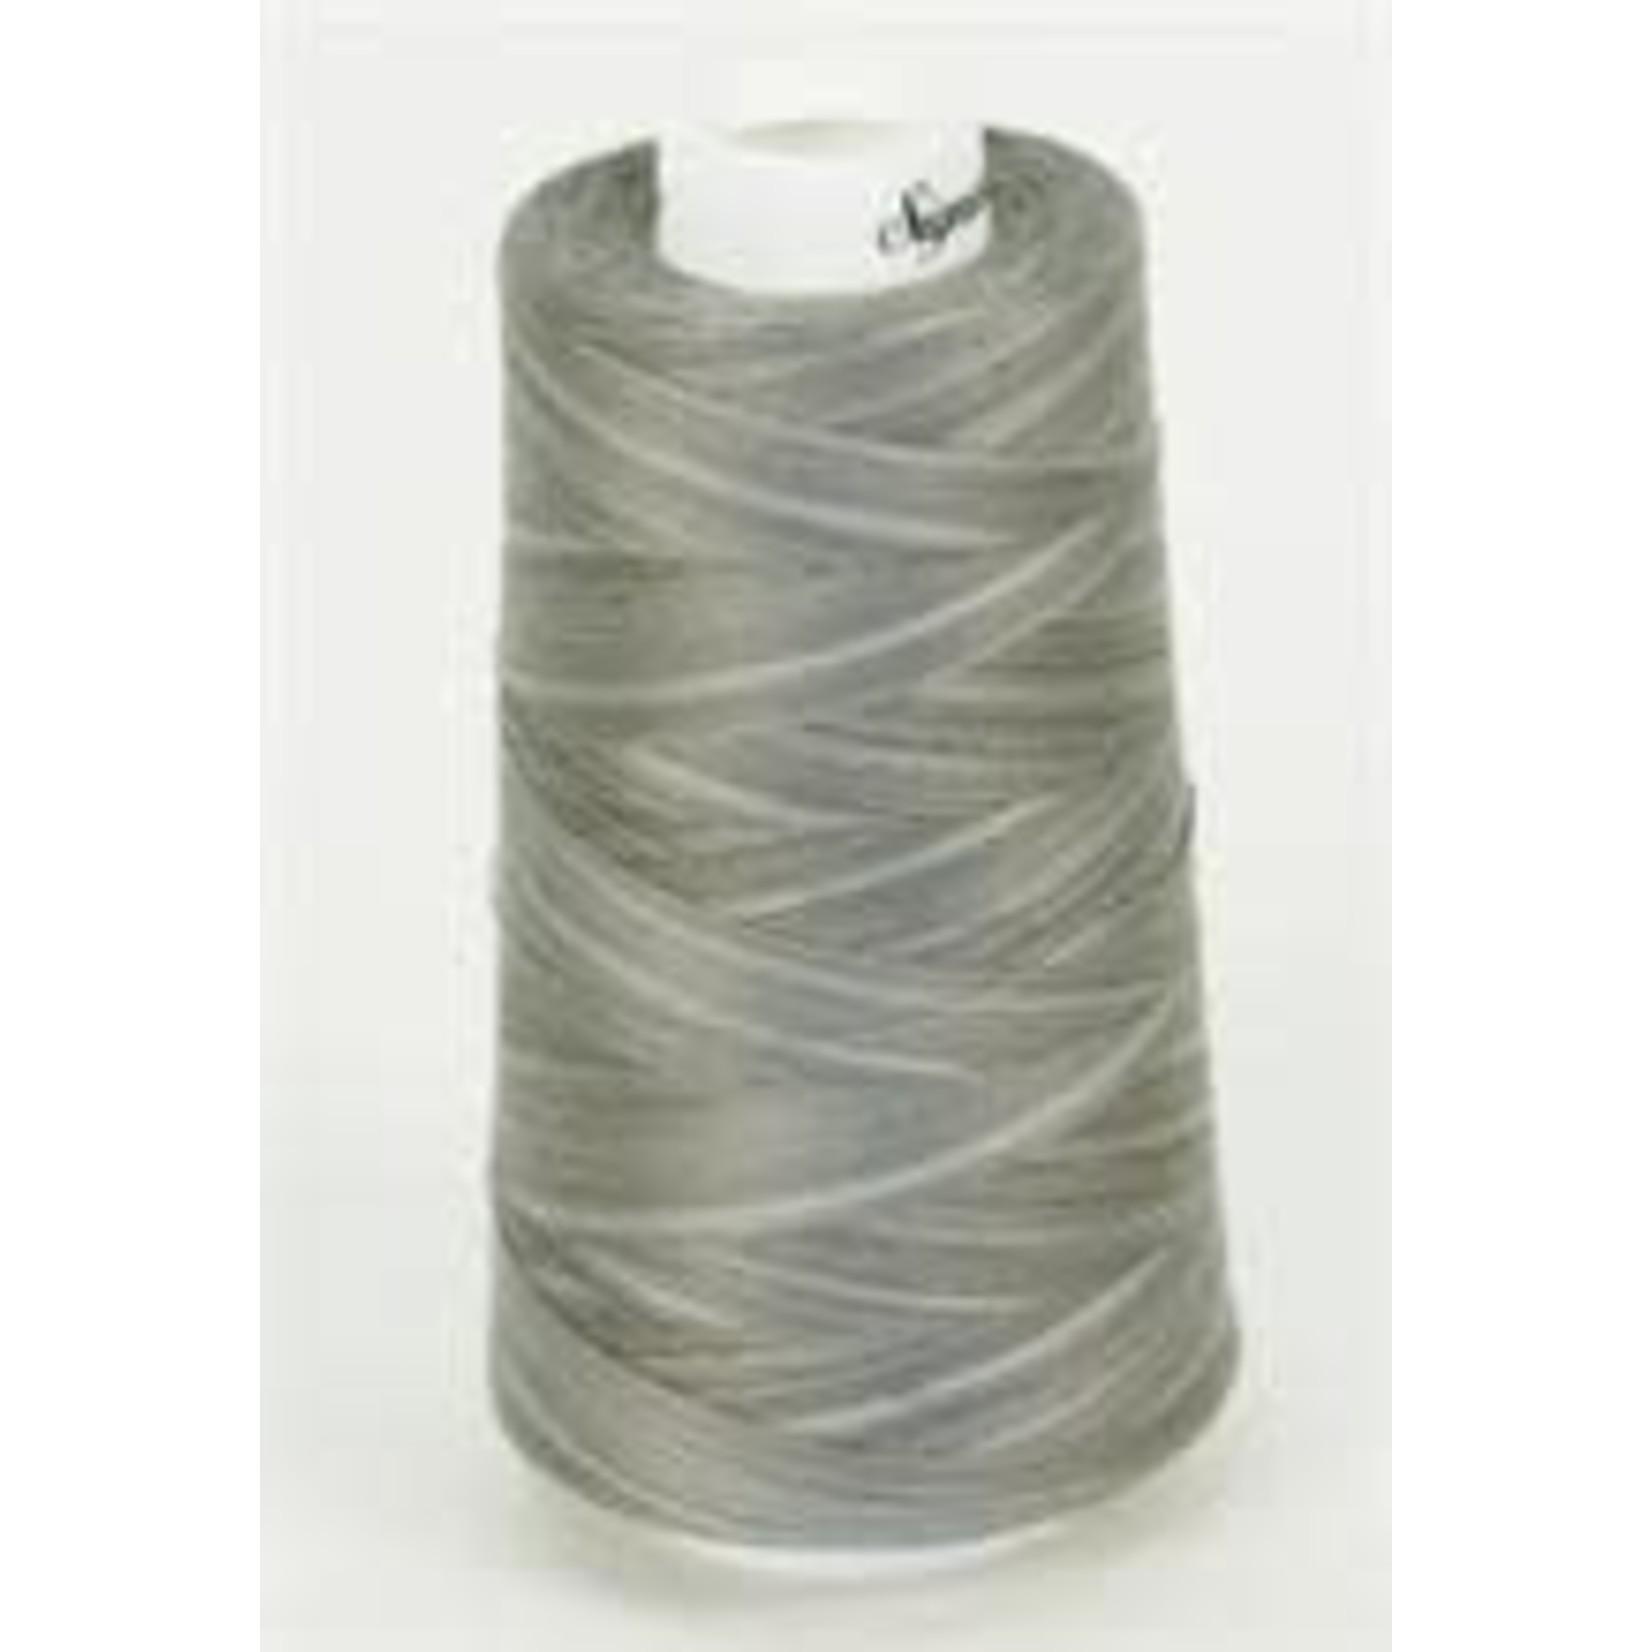 A & E Grey Shades, Signature Cotton